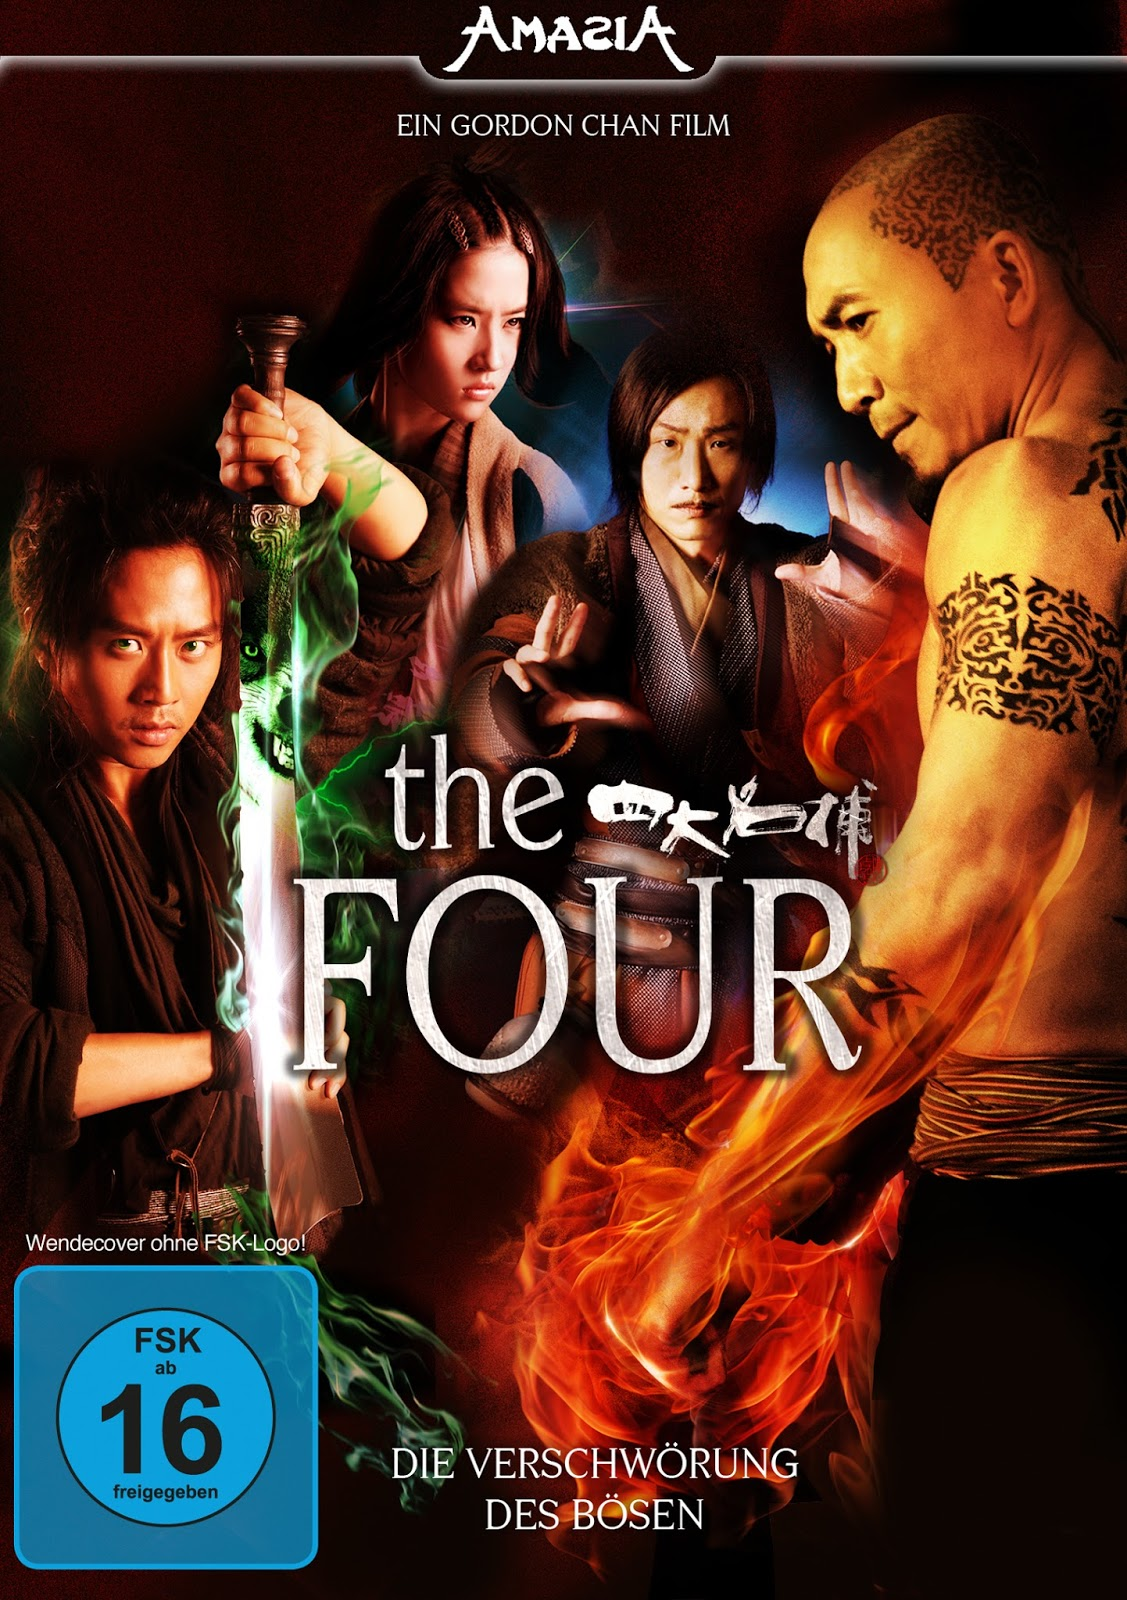 The Four 3 Final Battle 4 มหากาฬพญายม ภาค 3 ศึกครั้งสุดท้าย [HD][พากย์ไทย]